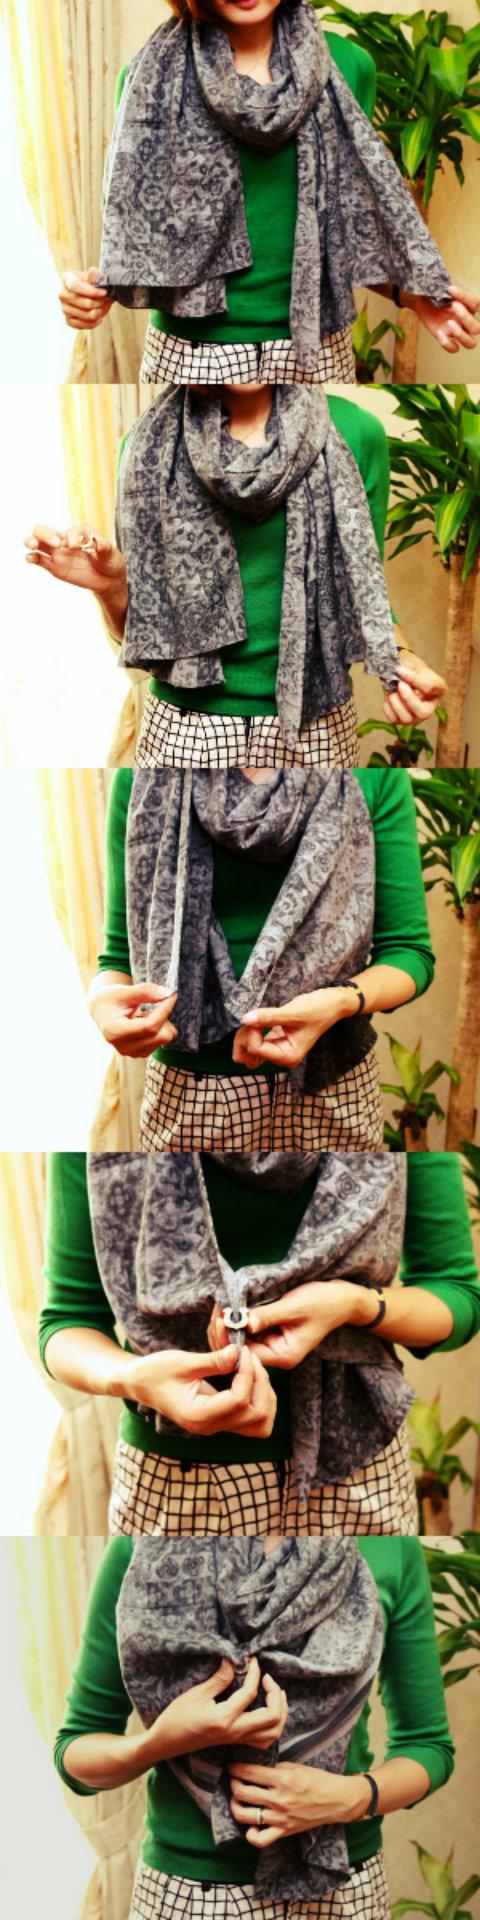 makico_scarf_02_04